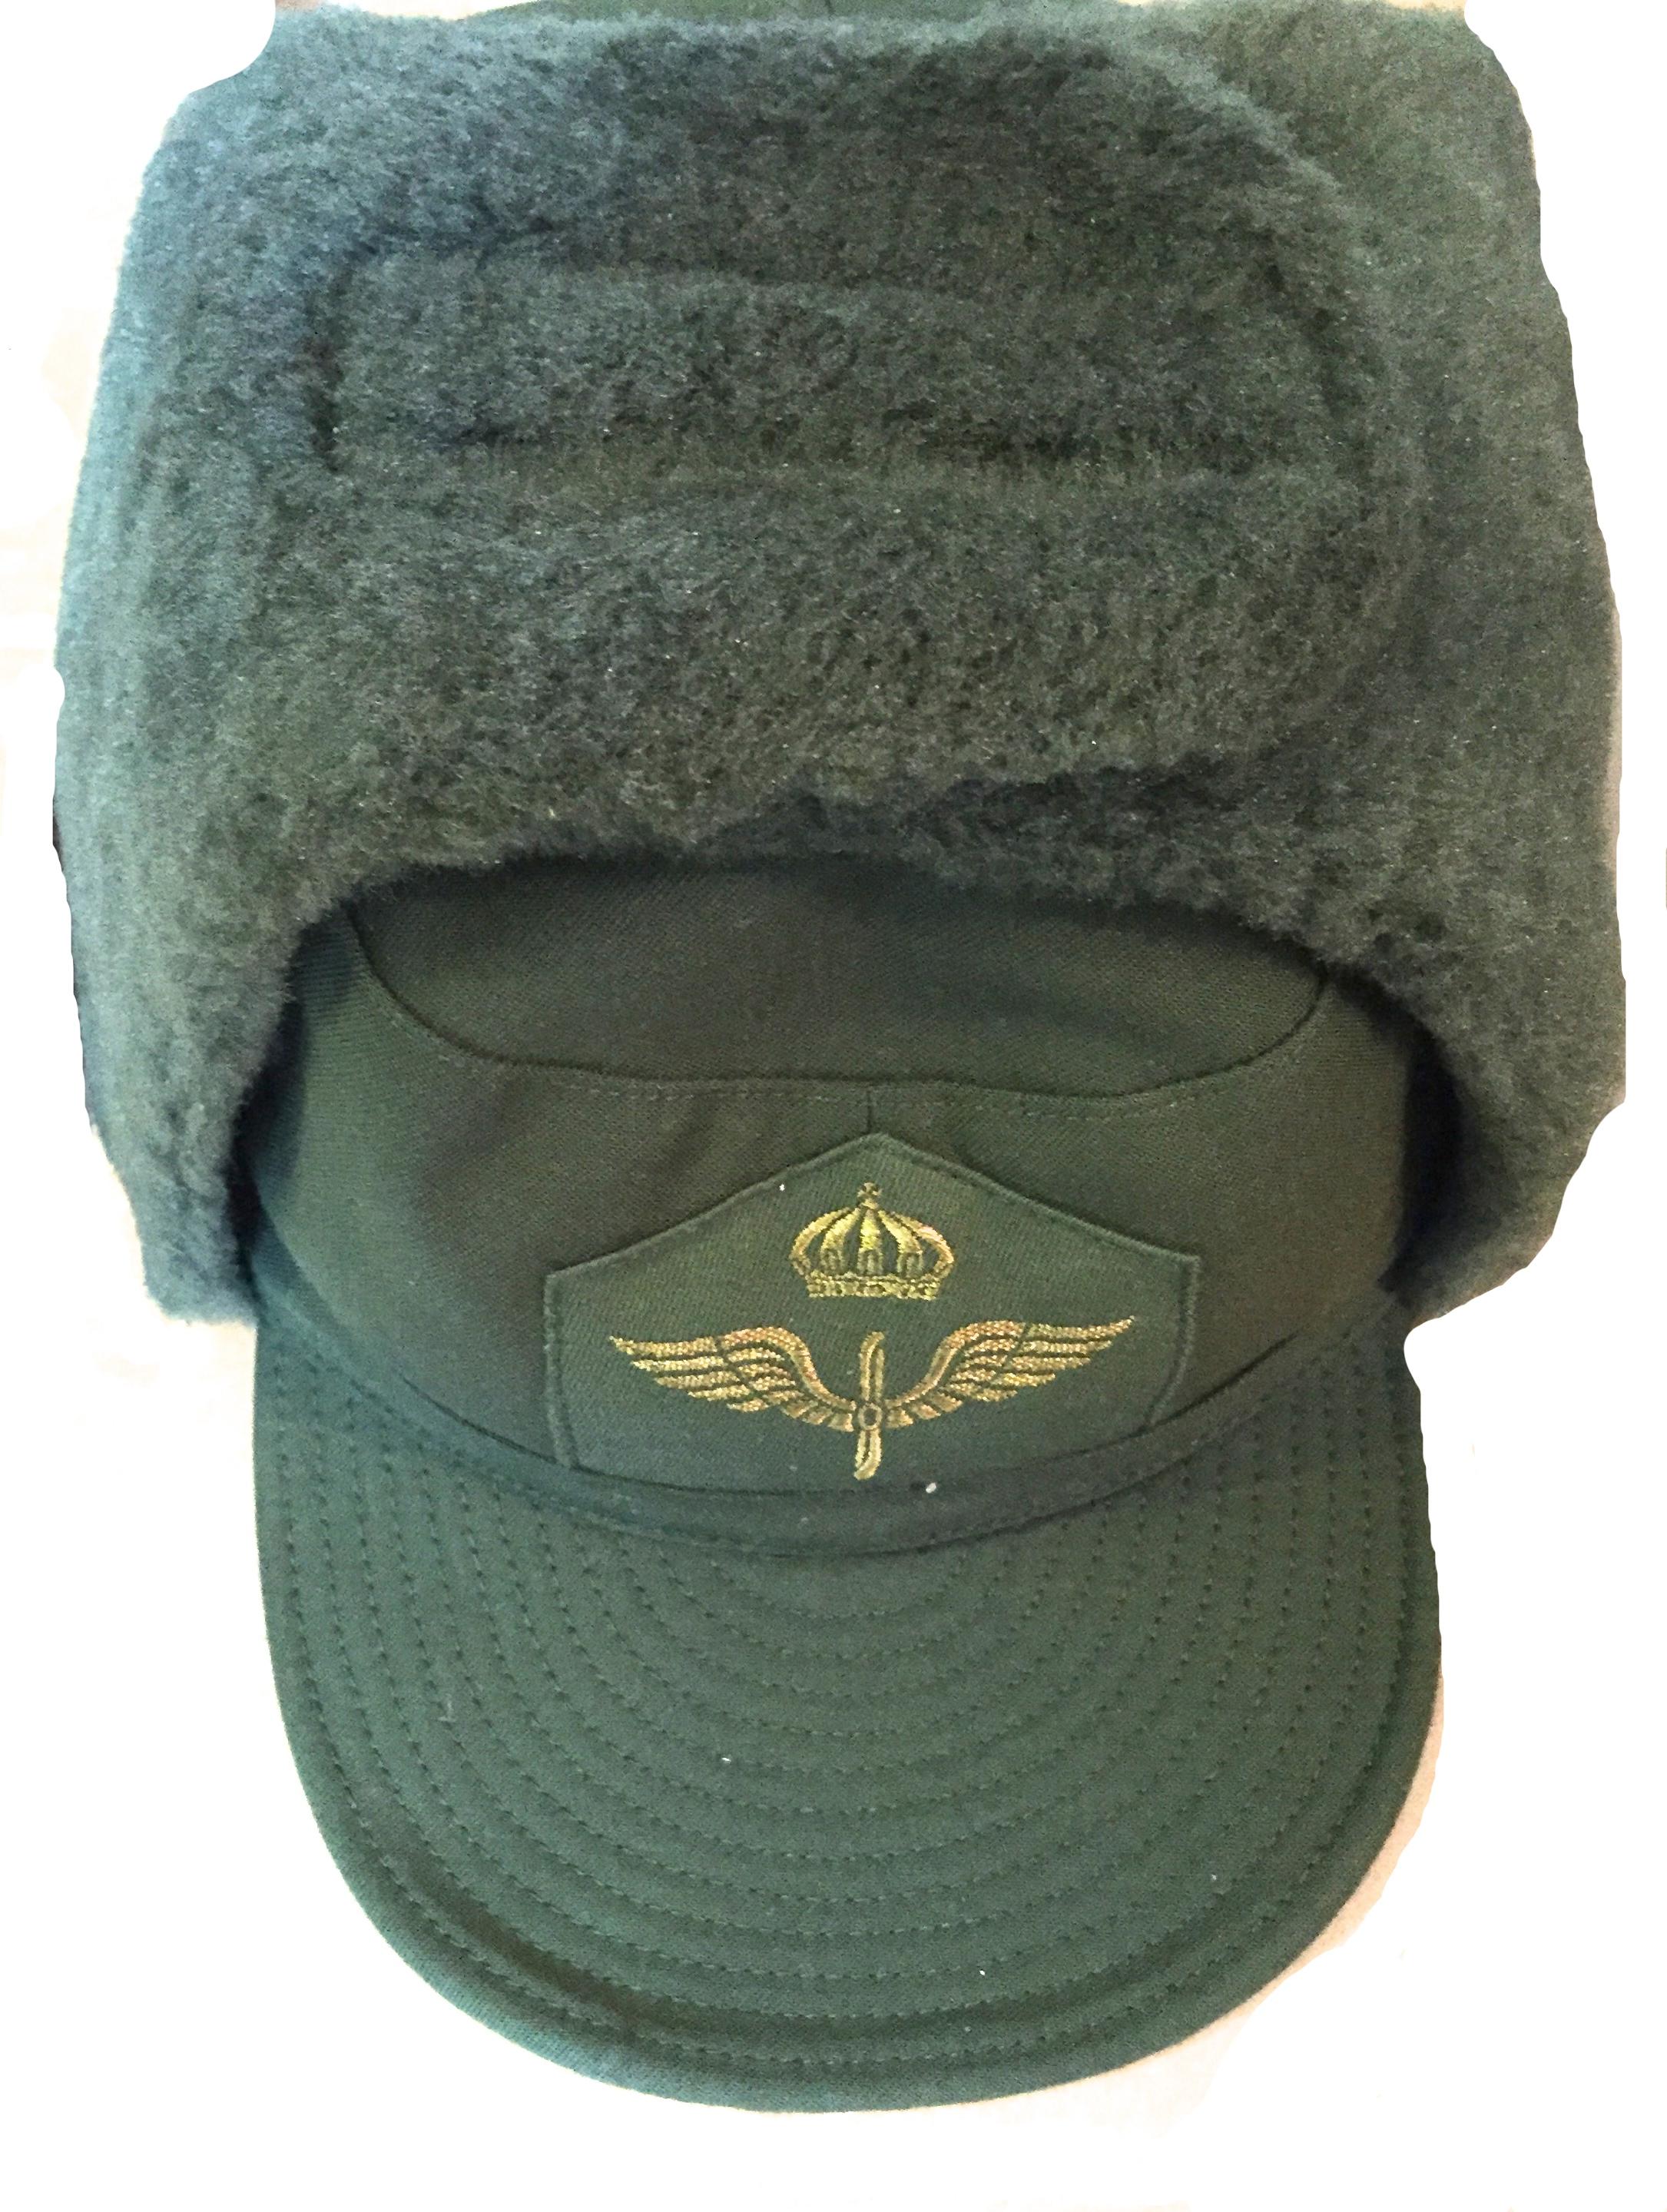 Swedish army winter hat m 59 FV with velcro - Beredskapsboden 2b314a17ded